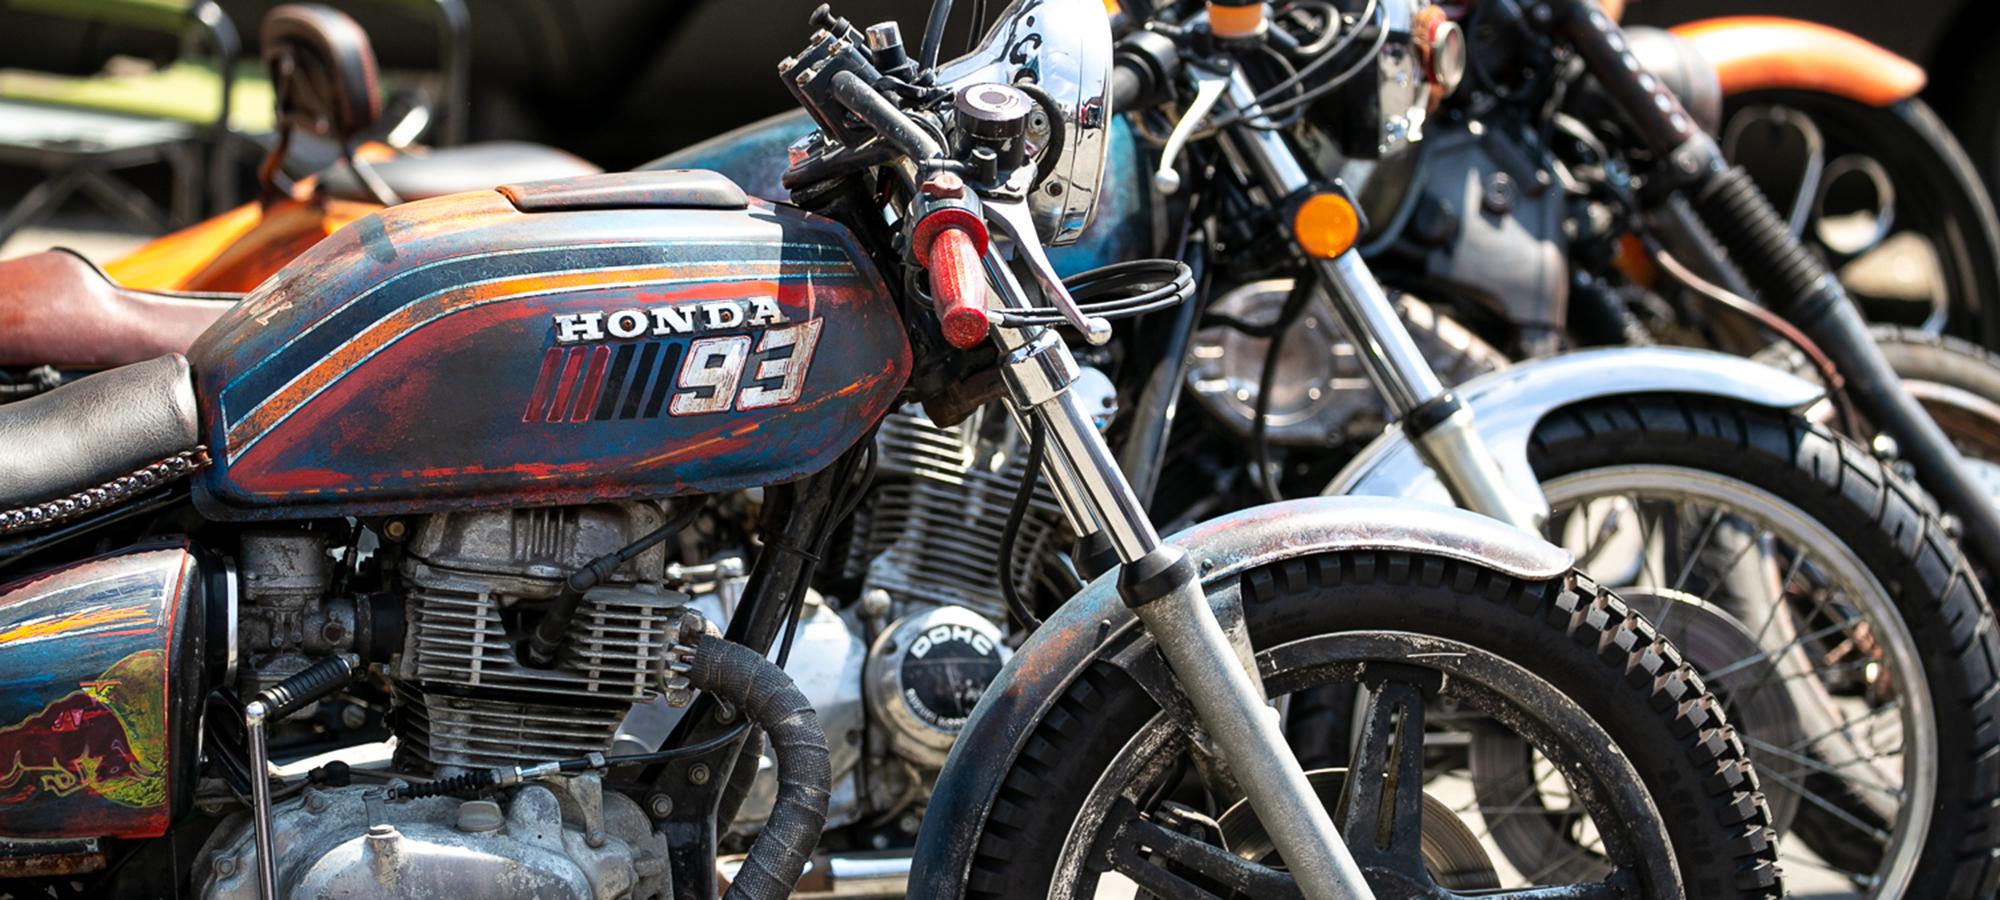 Honda motorcycle at the Motoblot custom show.